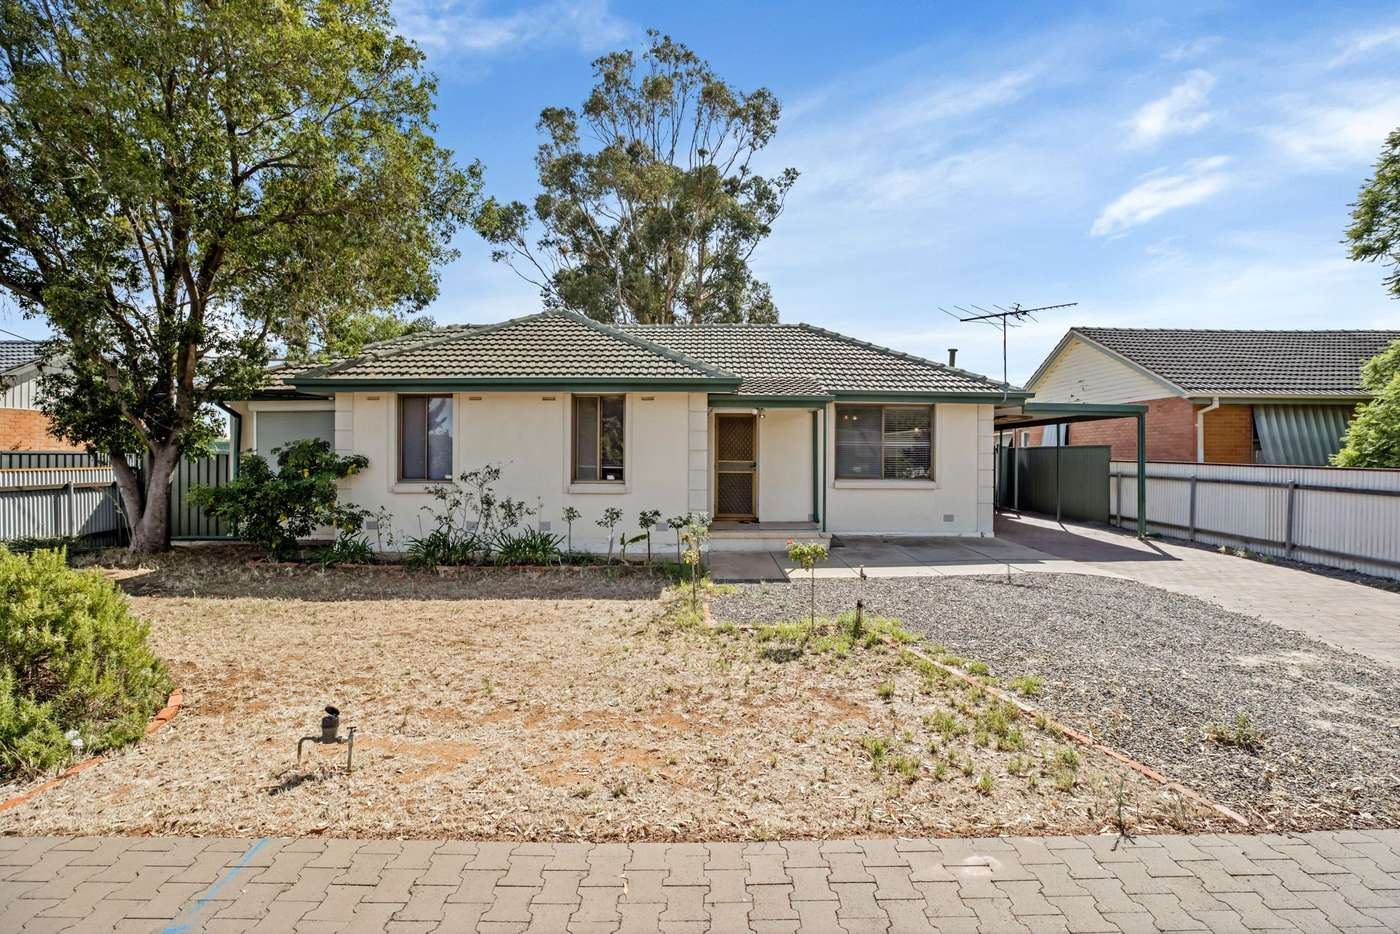 Main view of Homely house listing, 70 Whitington Road, Davoren Park SA 5113